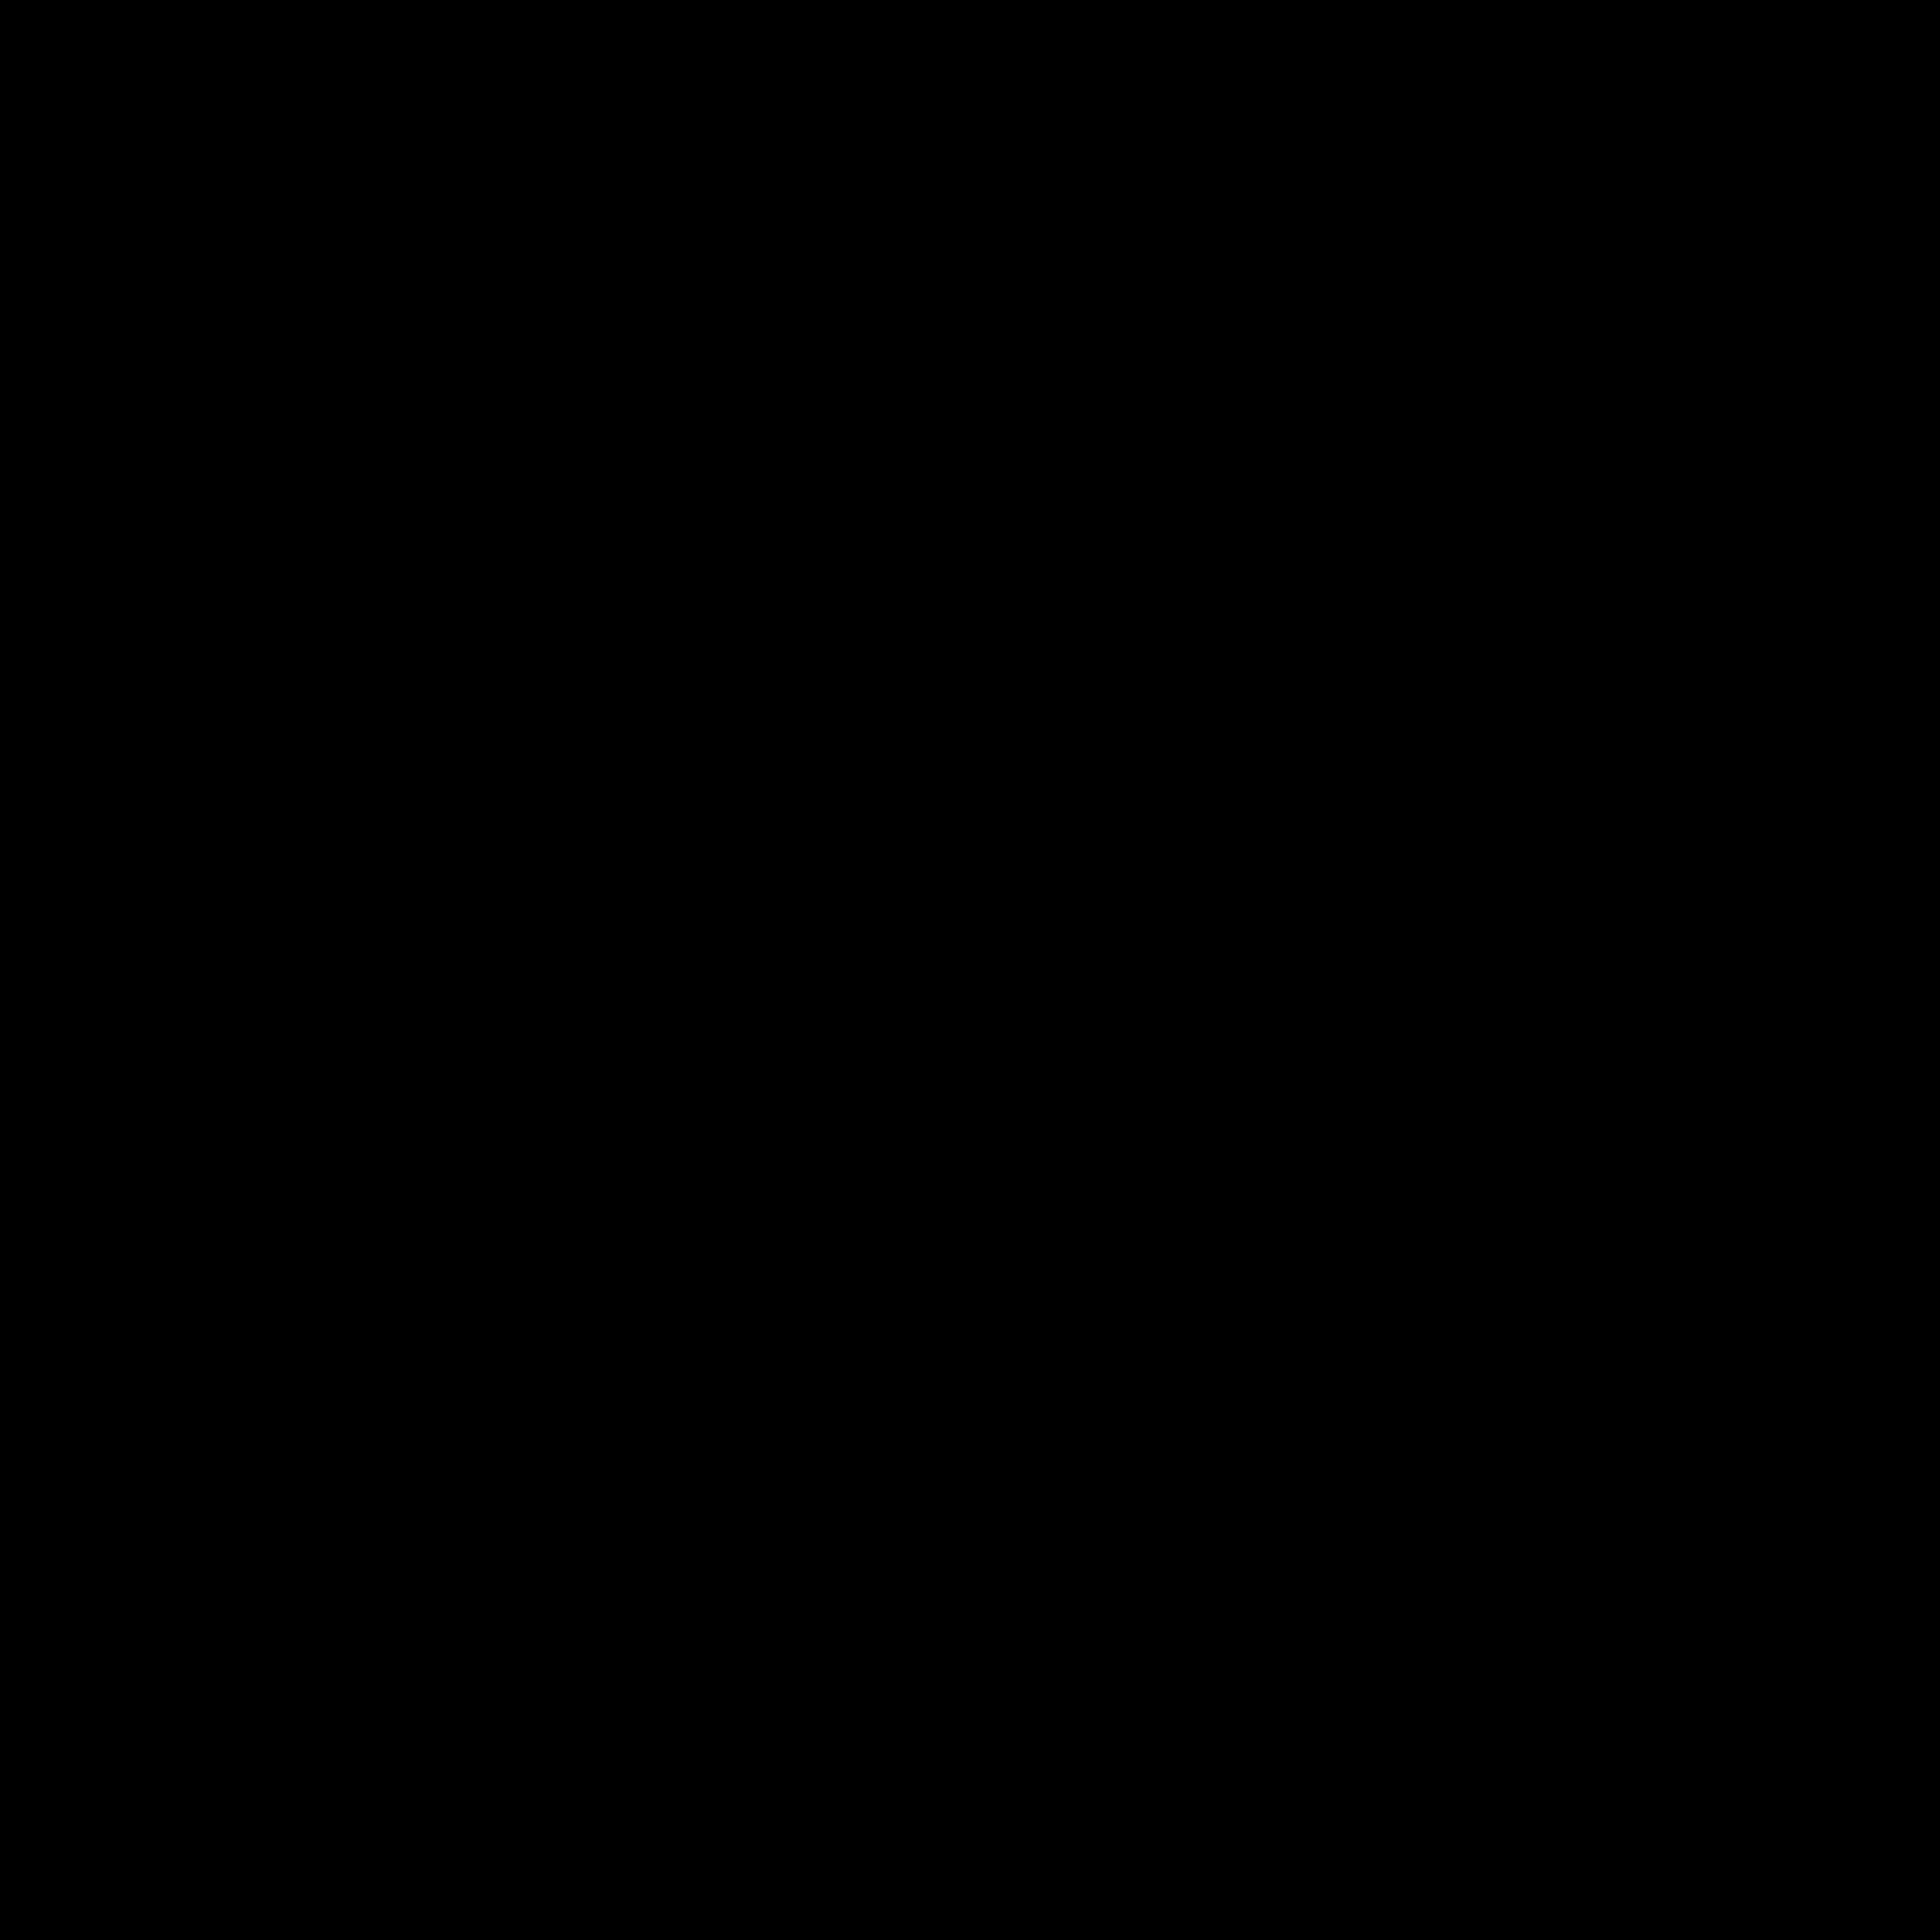 Zildjian Logo PNG Transparent & SVG Vector.